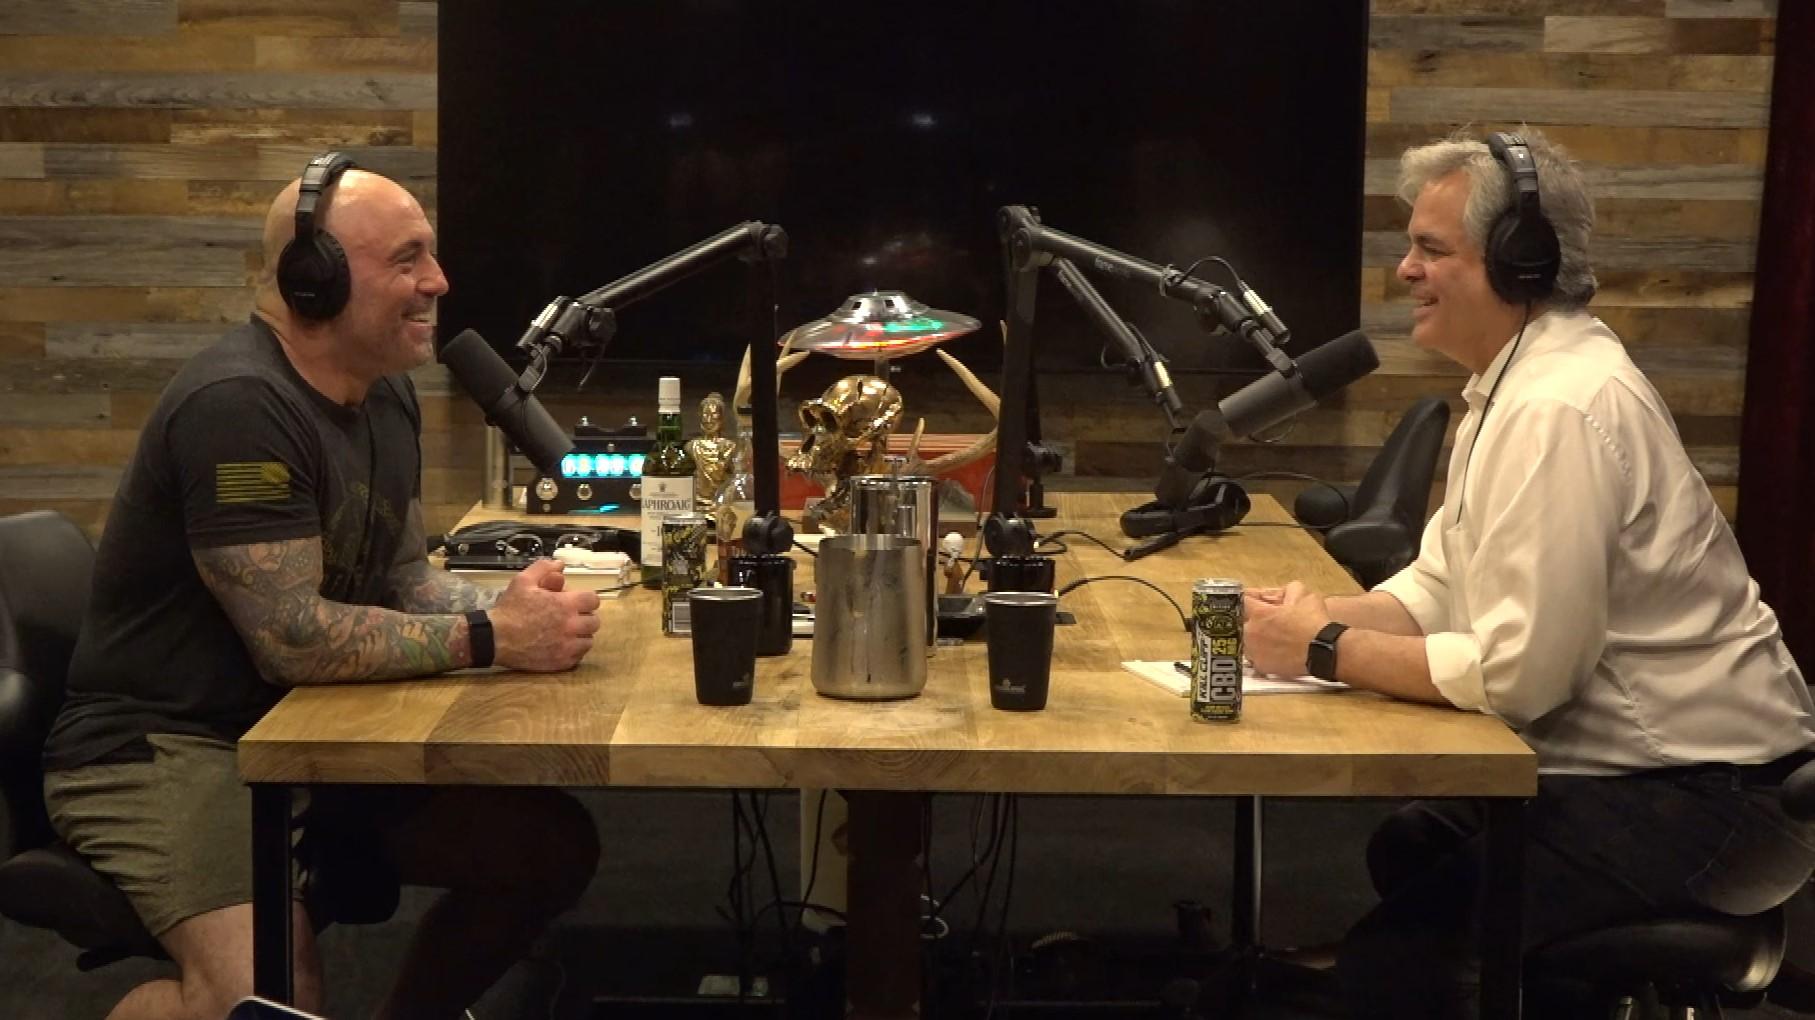 Joe Rogan interviews Mayor Steve Adler